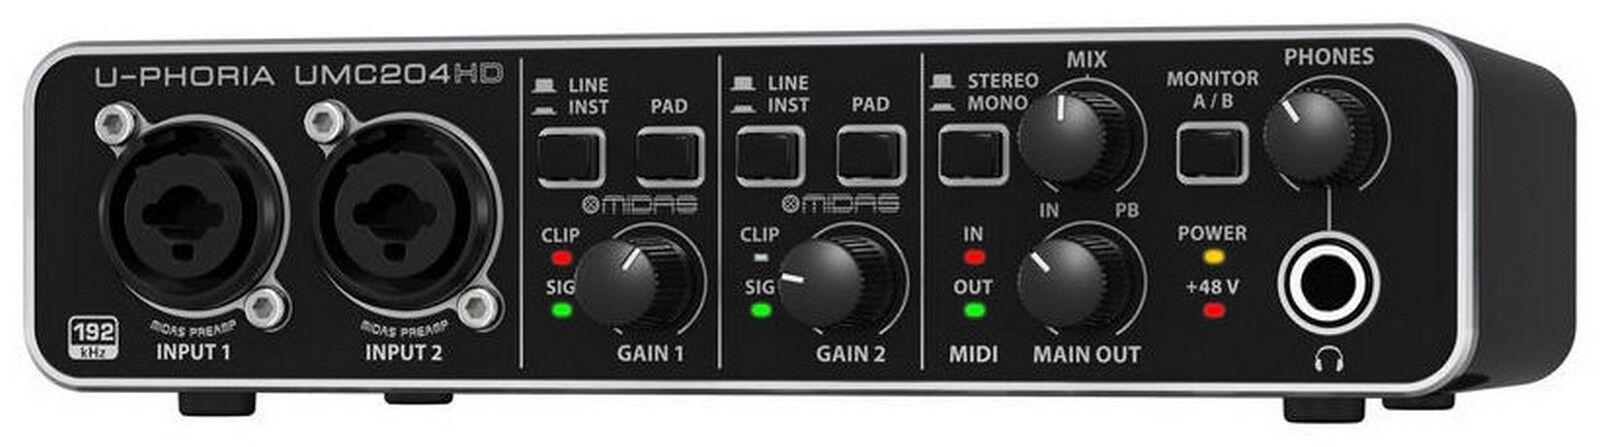 BEHRINGER UMC204HD INTERFACCIA AUDIO 2x4 MIDI/USB 24 BIT/192 KHZ - PREAMP. MIDAS